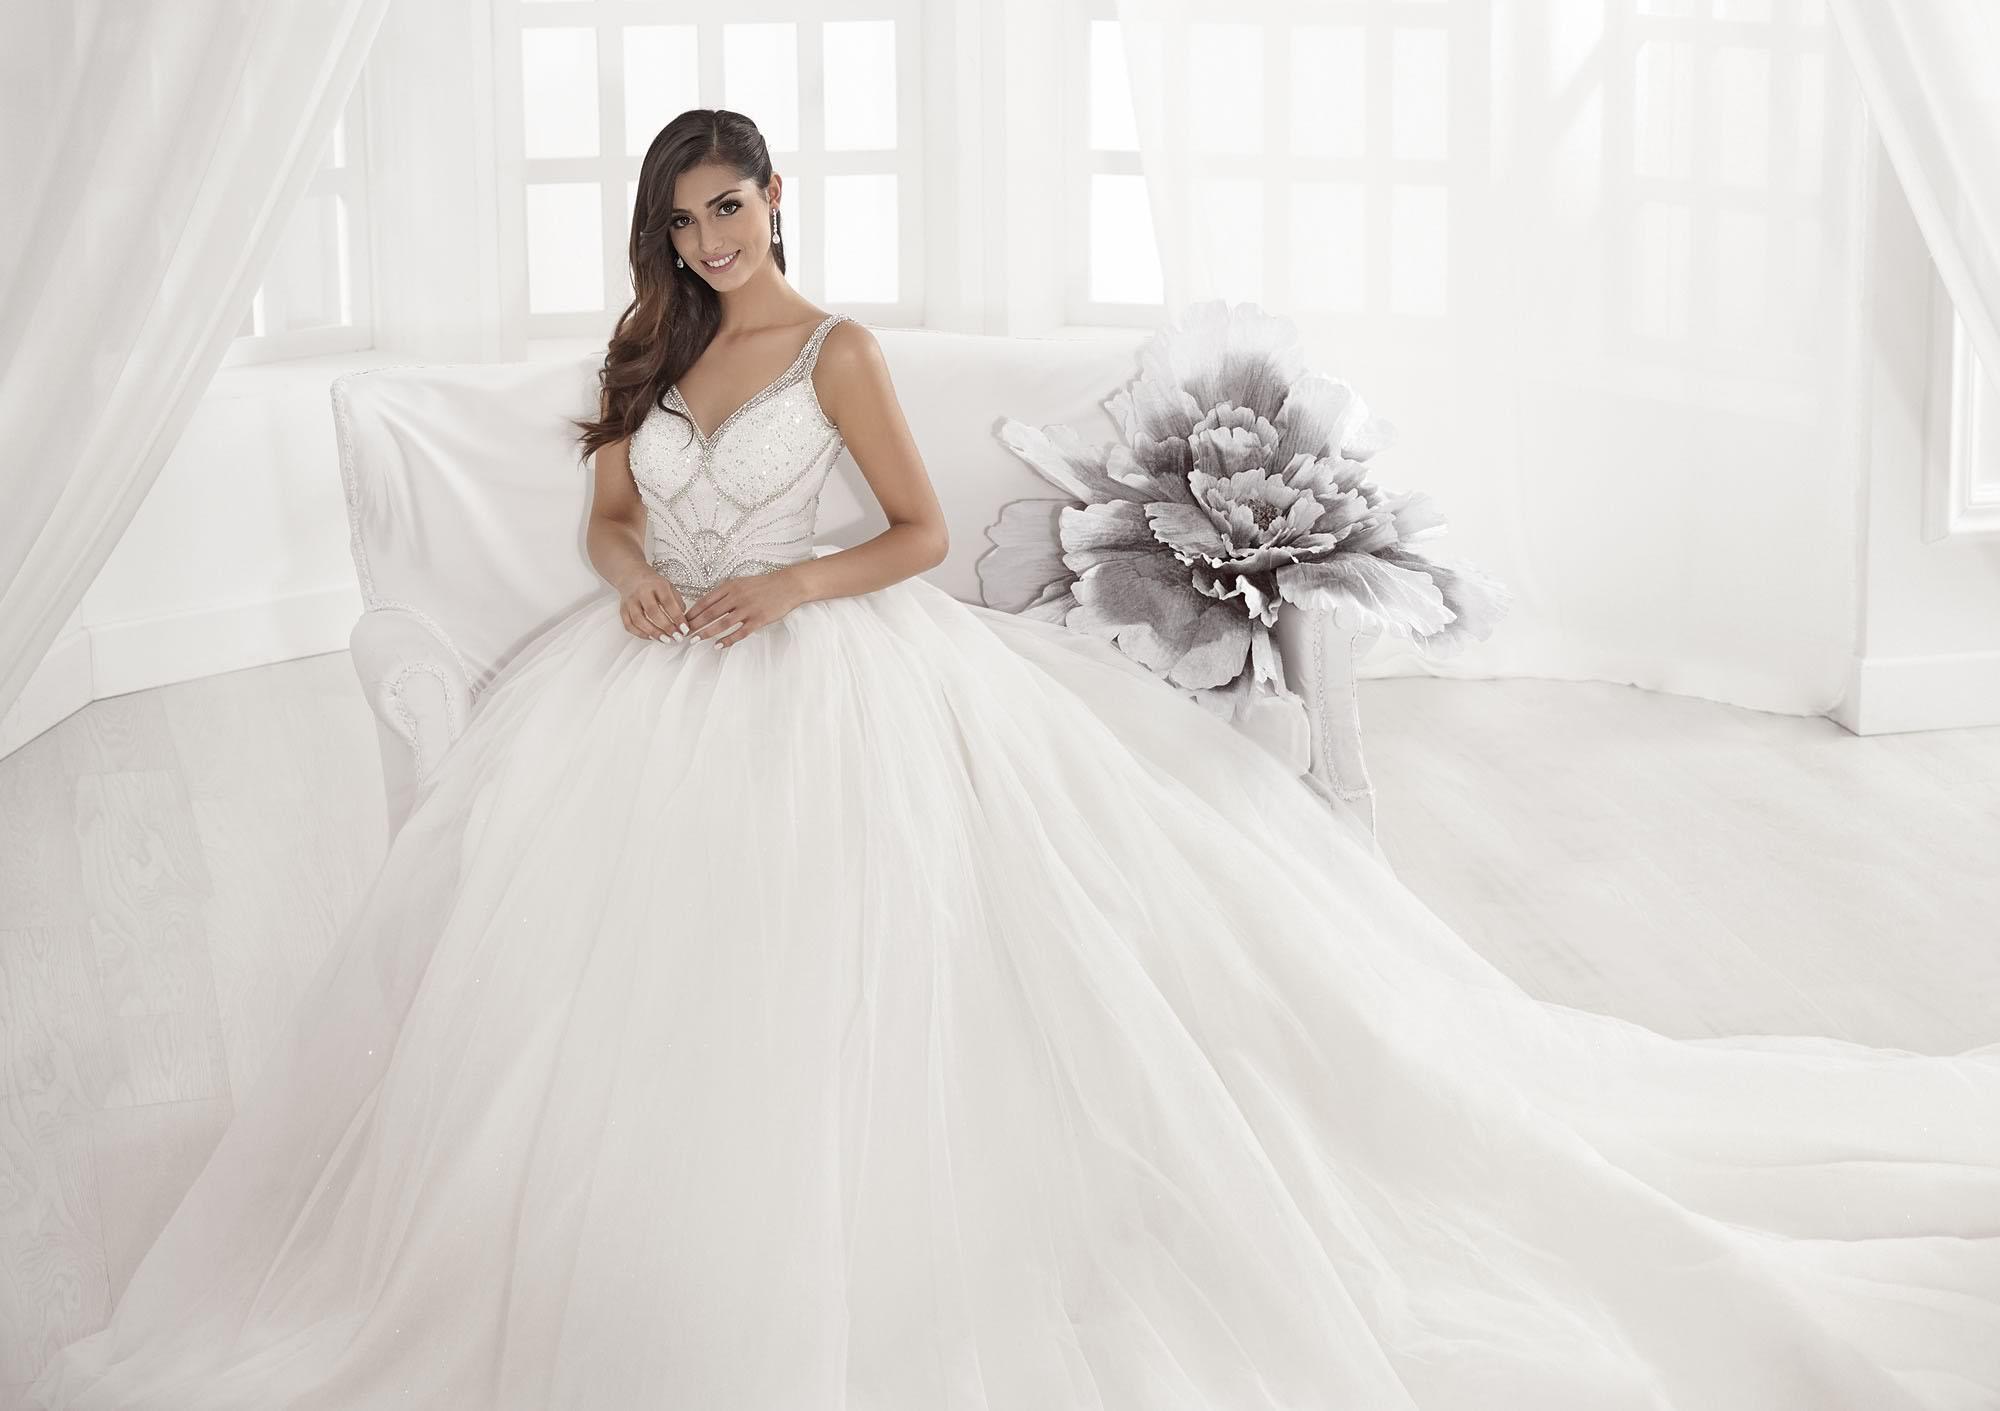 Vestidos novia parla